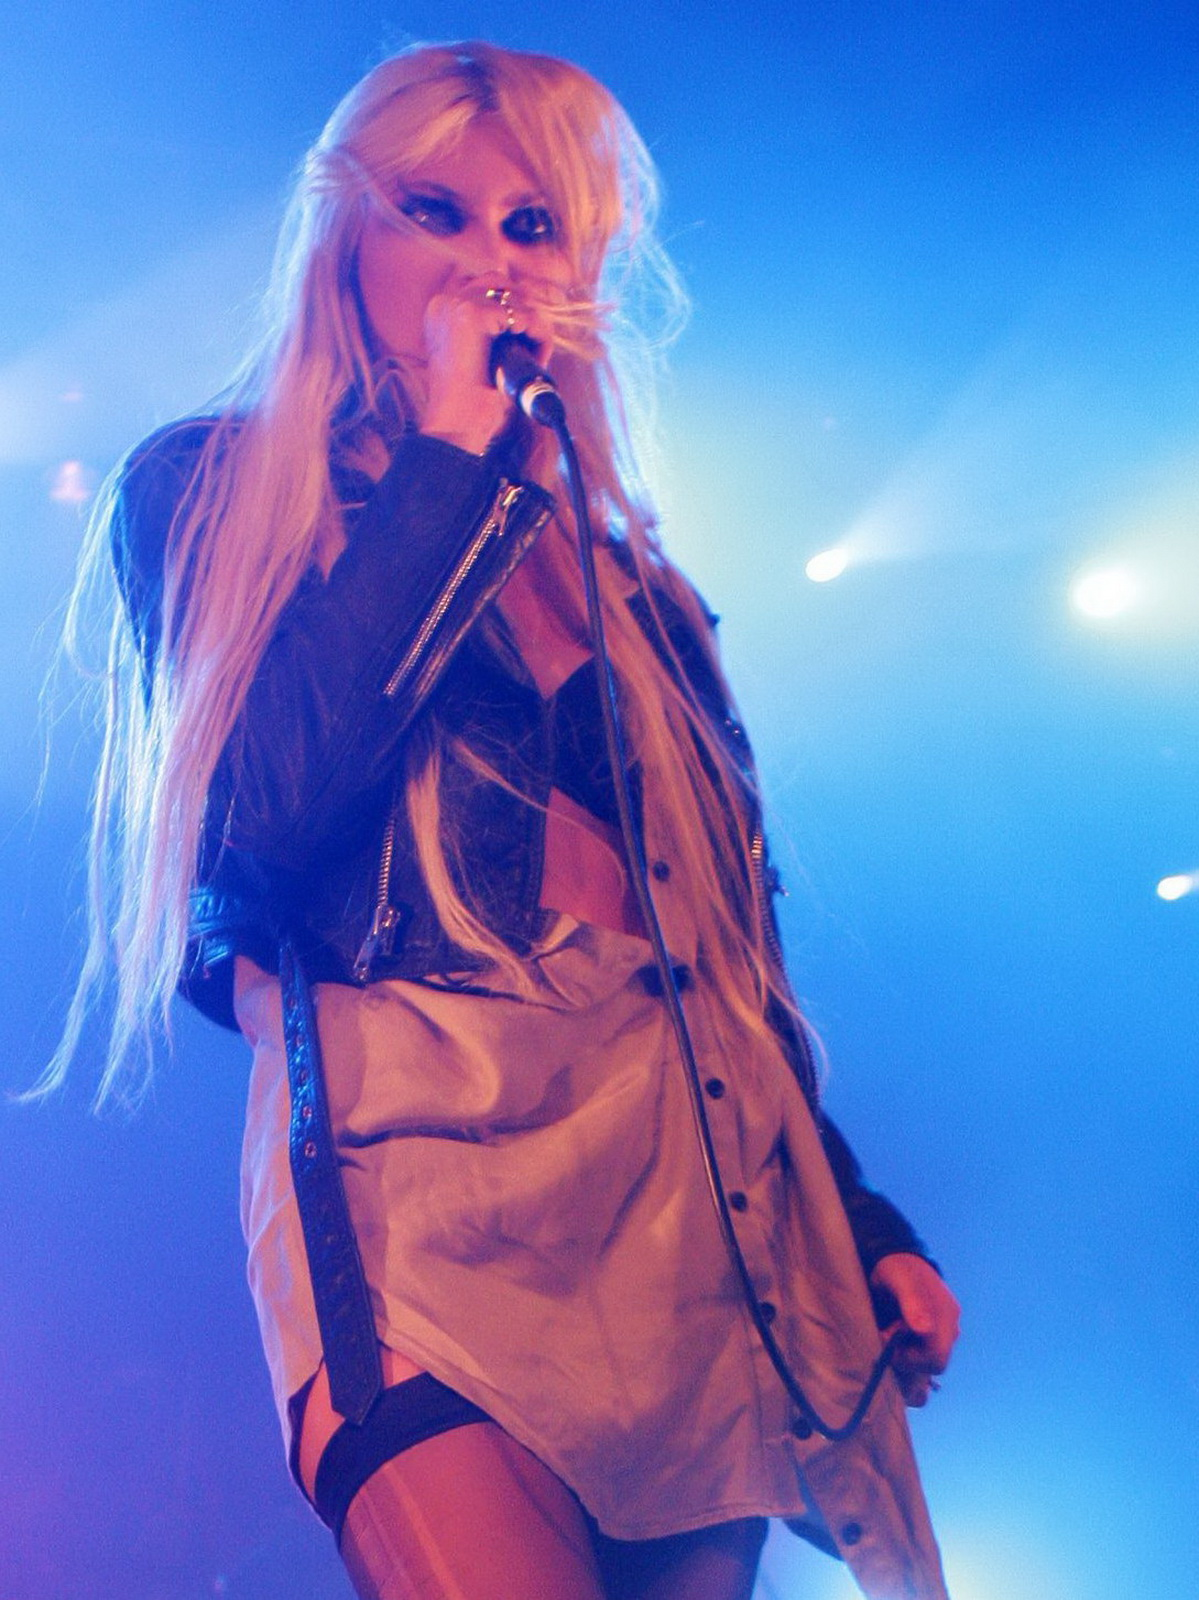 http://3.bp.blogspot.com/_NRGPIrDtEg8/TQswFHKmbuI/AAAAAAAAAbI/grHK0Eu5X0k/s1600/Taylor_Momsen_cleavage_3.jpg